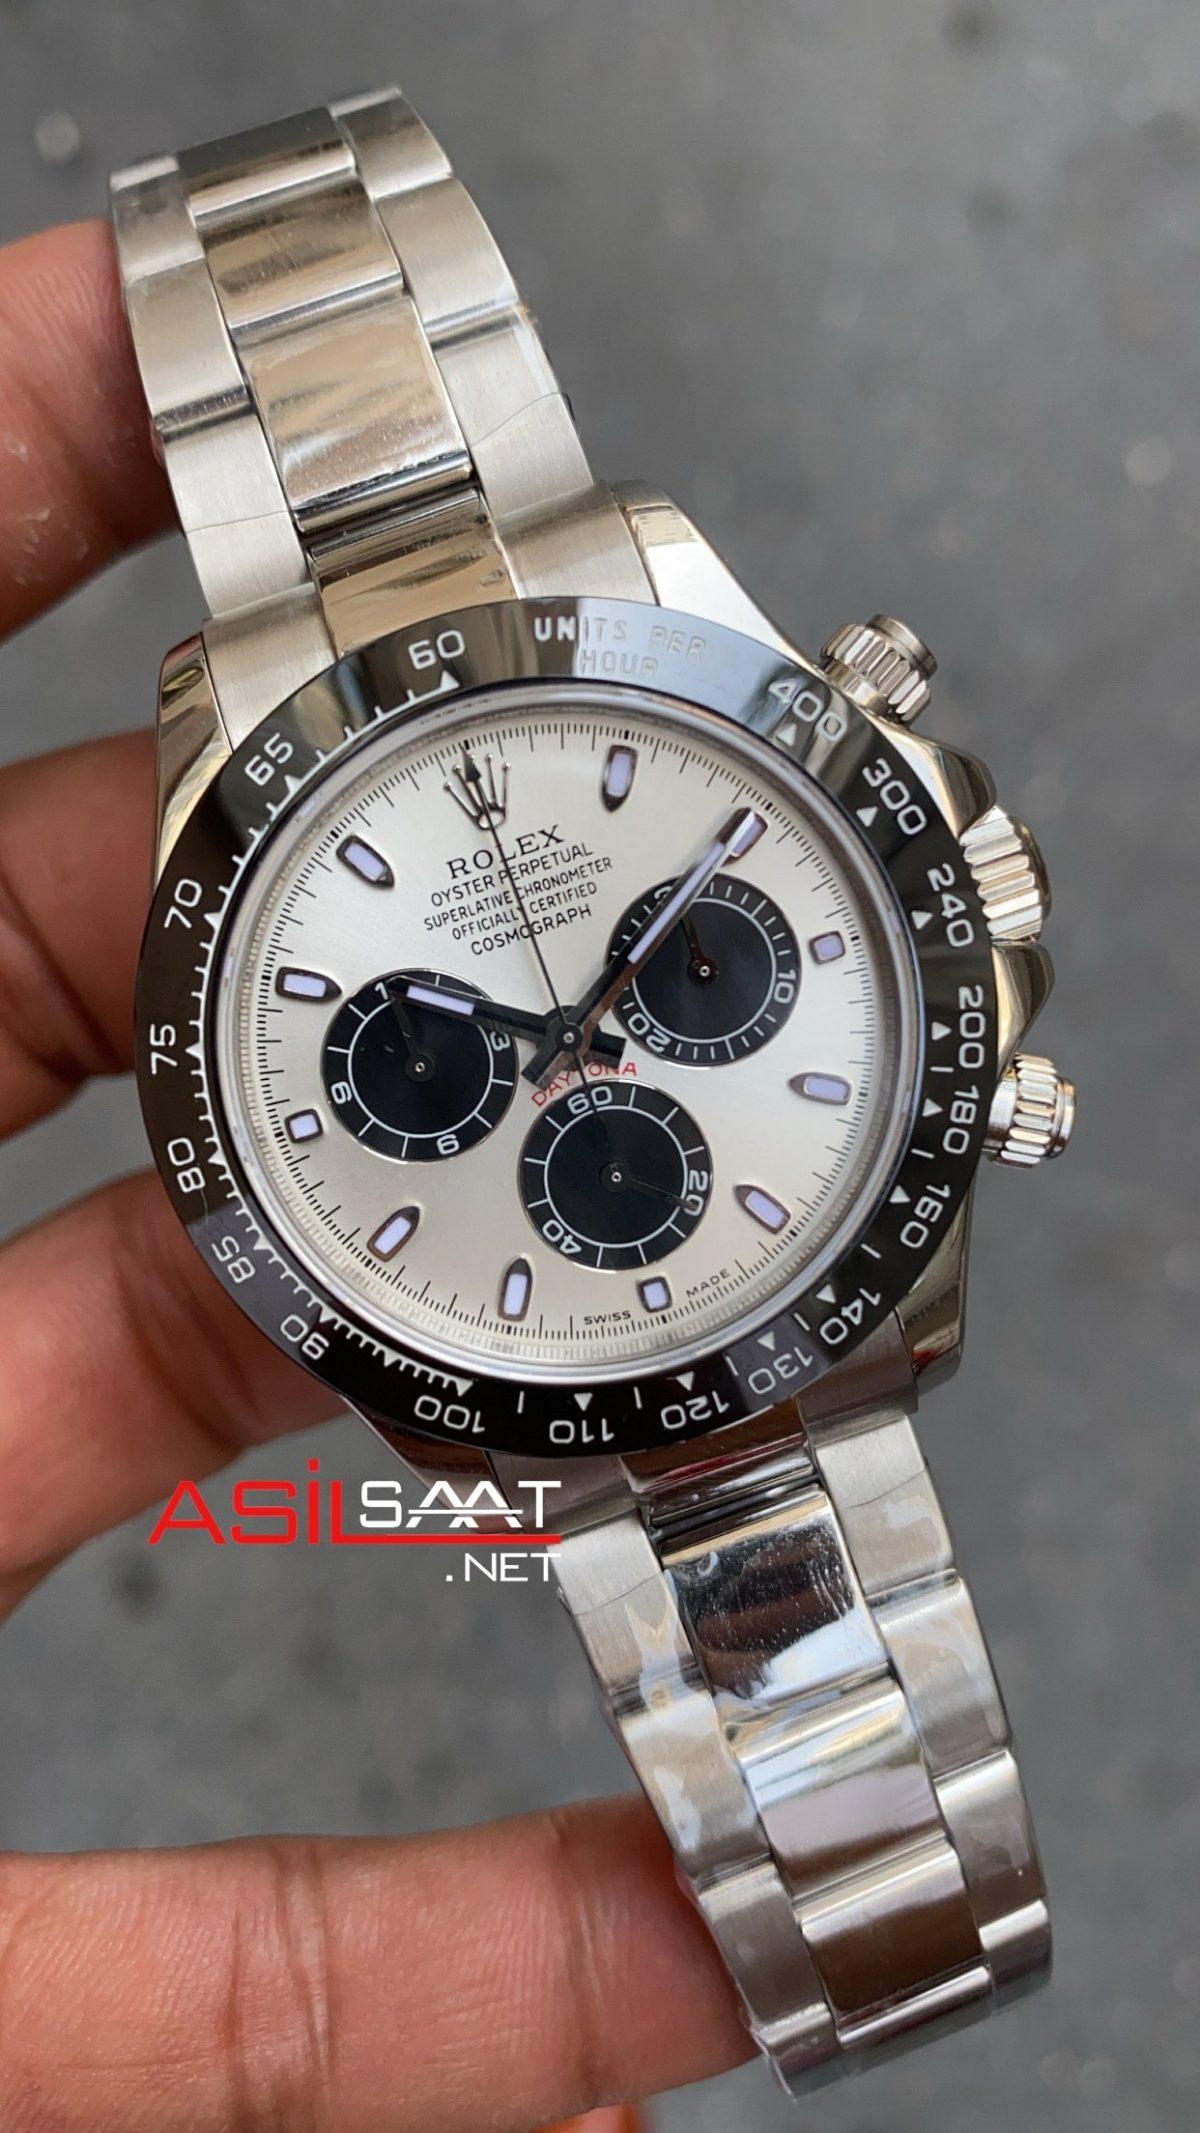 Rolex Daytona Cosmograph 116500 RDAE001